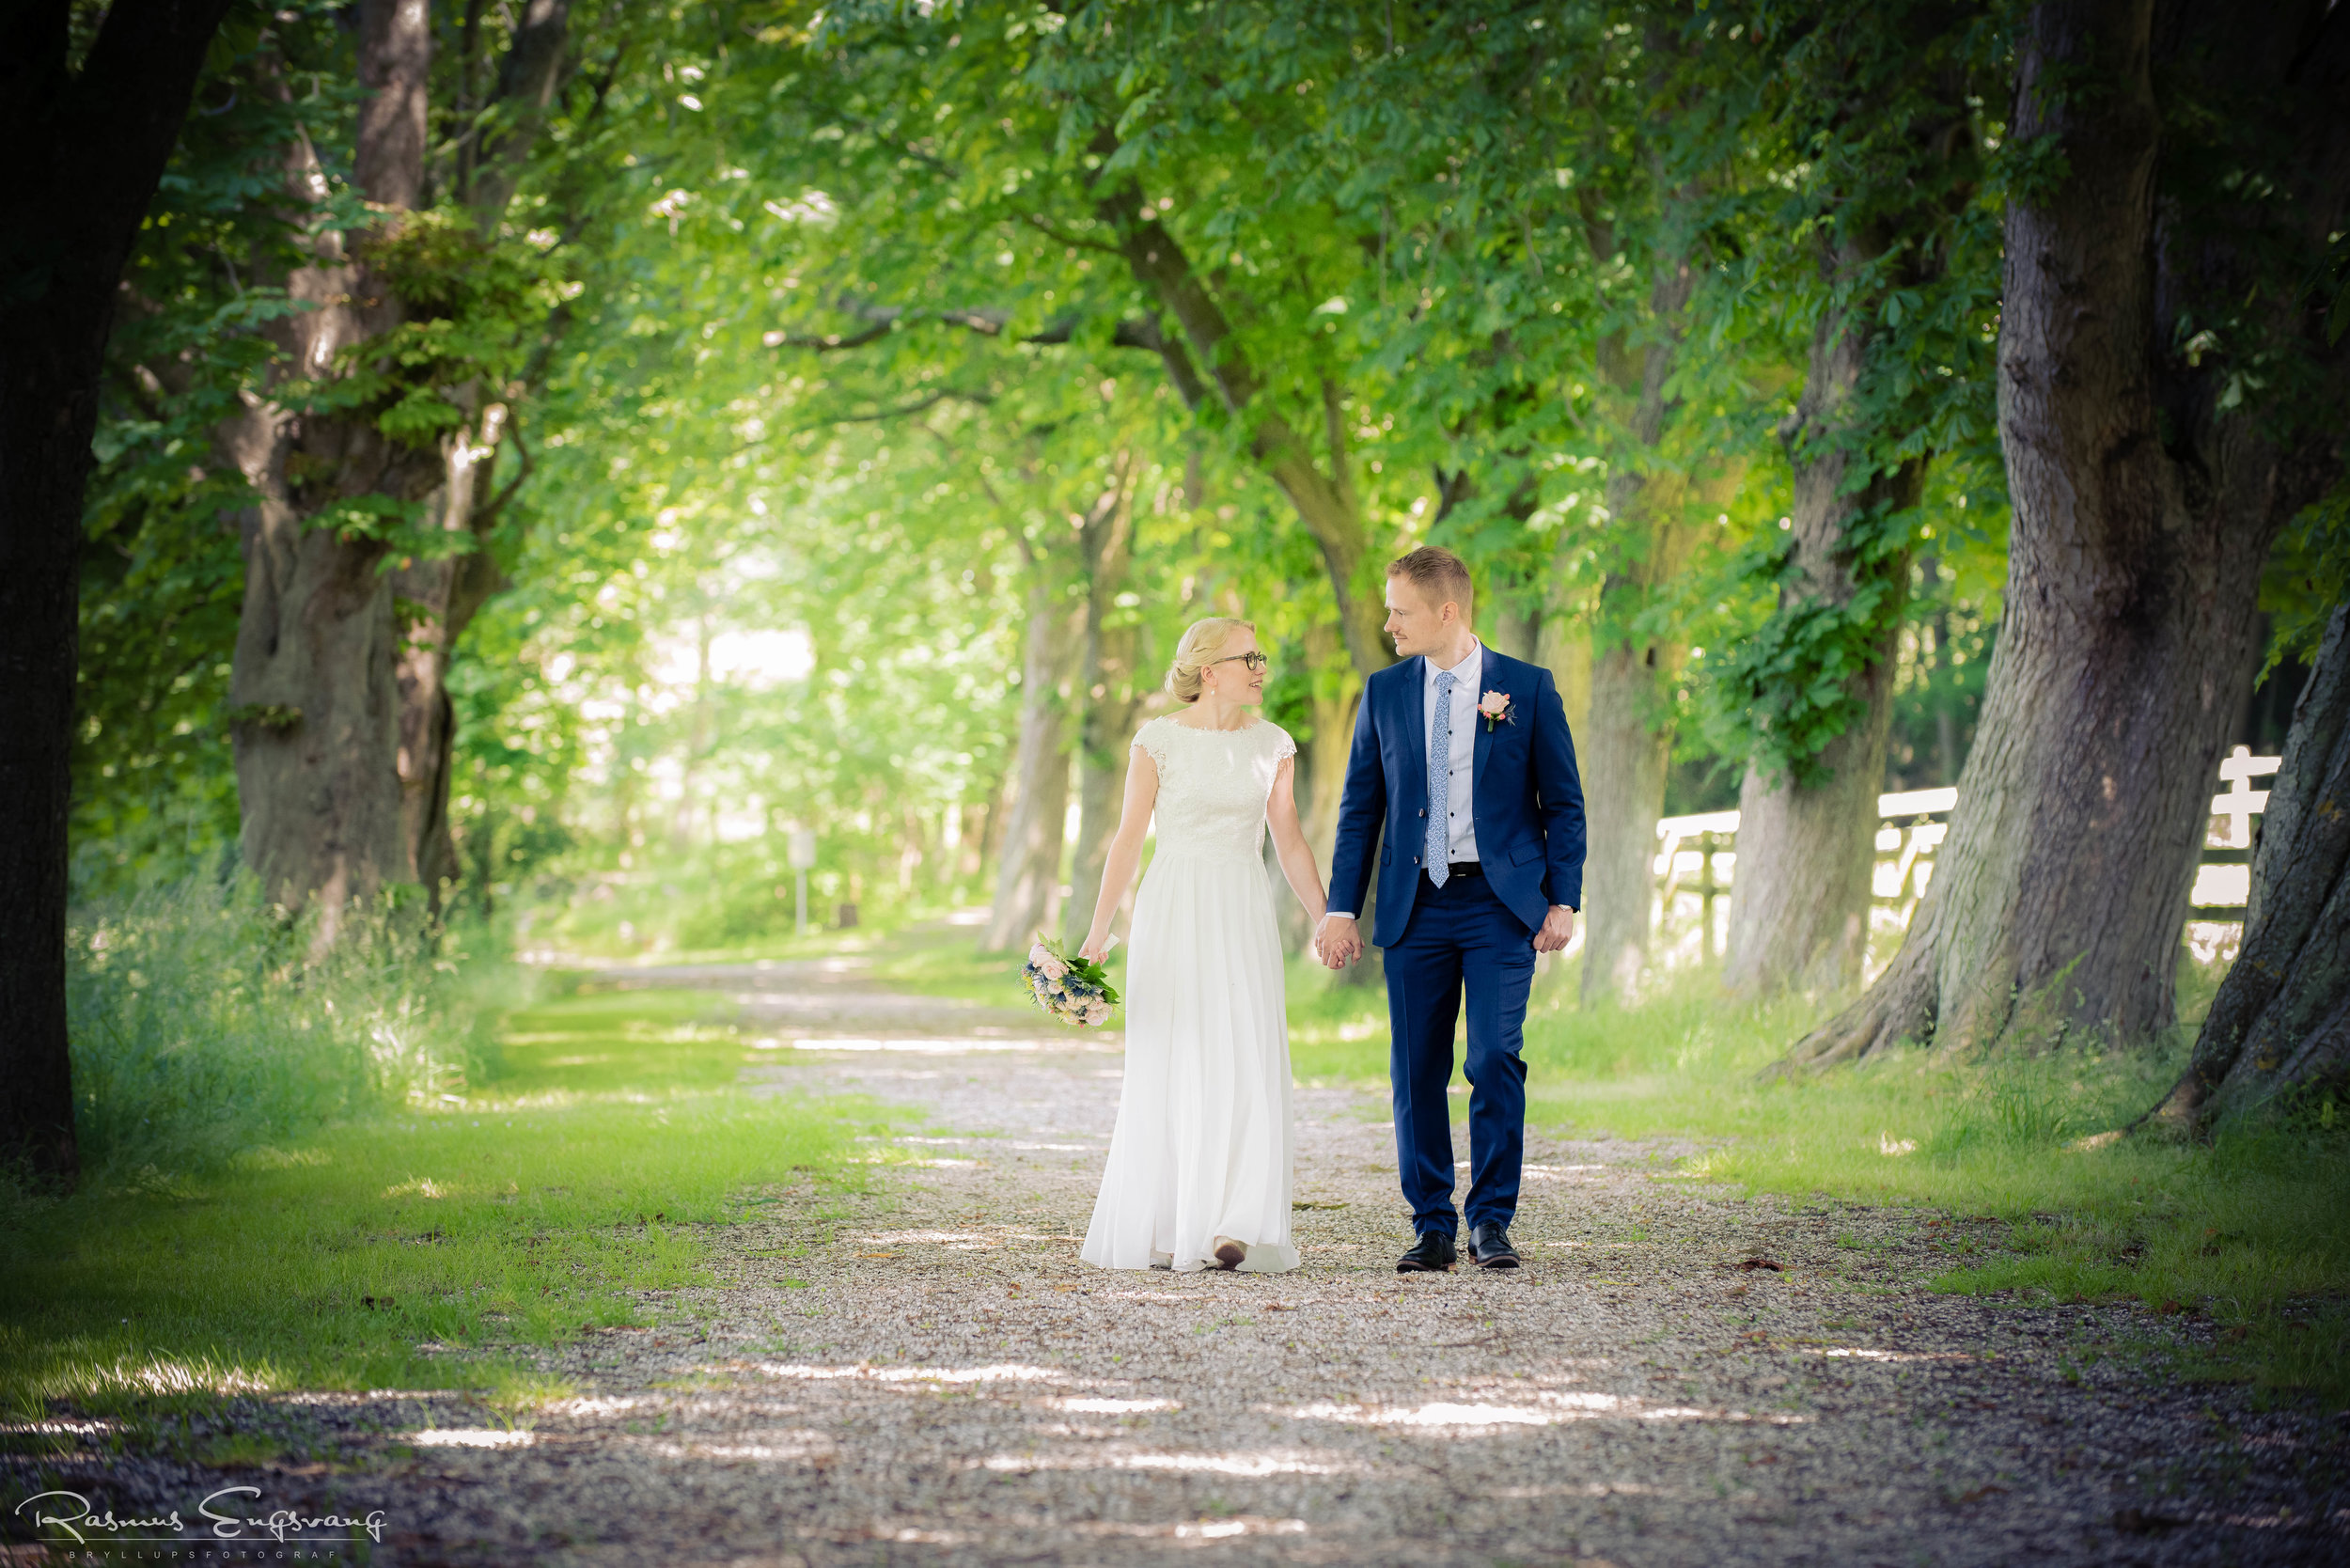 121-Bryllupsportrætter_Roskilde_Fjord.jpg